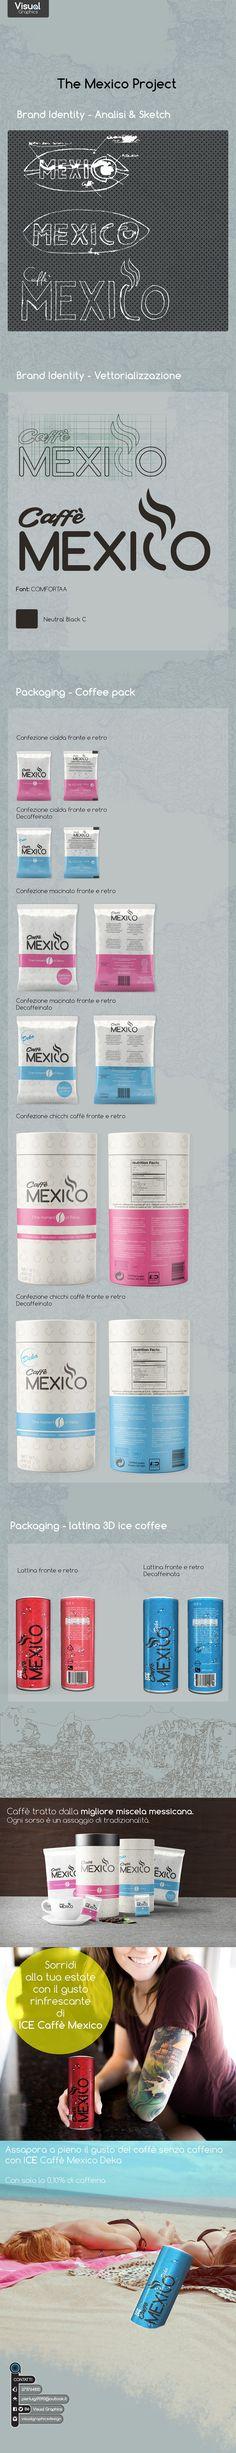 "Vedi il mio progetto @Behance: ""Logo Caffè Mexico Porject"" https://www.behance.net/gallery/54073375/Logo-Caffe-Mexico-Porject"